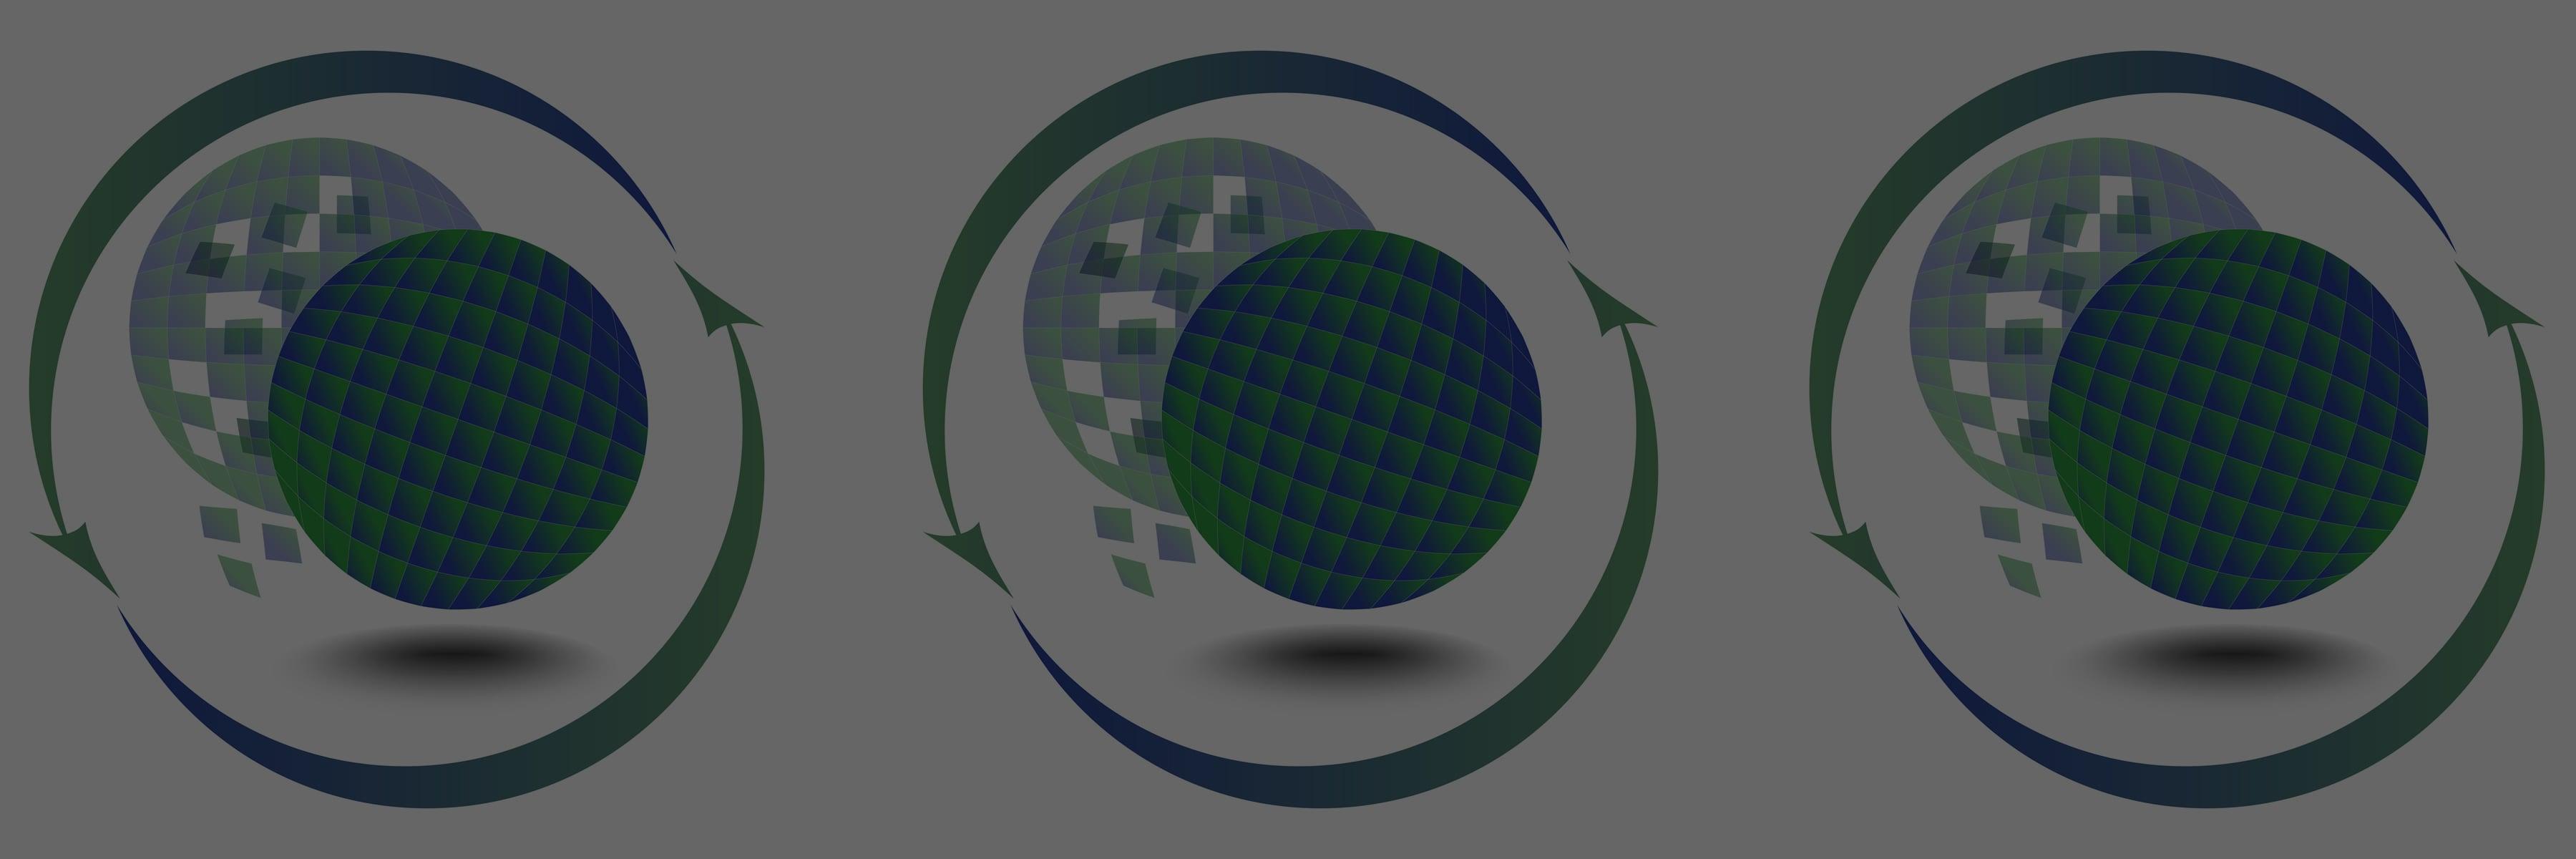 naem-webinar-2016-bringing-circular-economy-concepts-to-the-real-world-1800x600-min